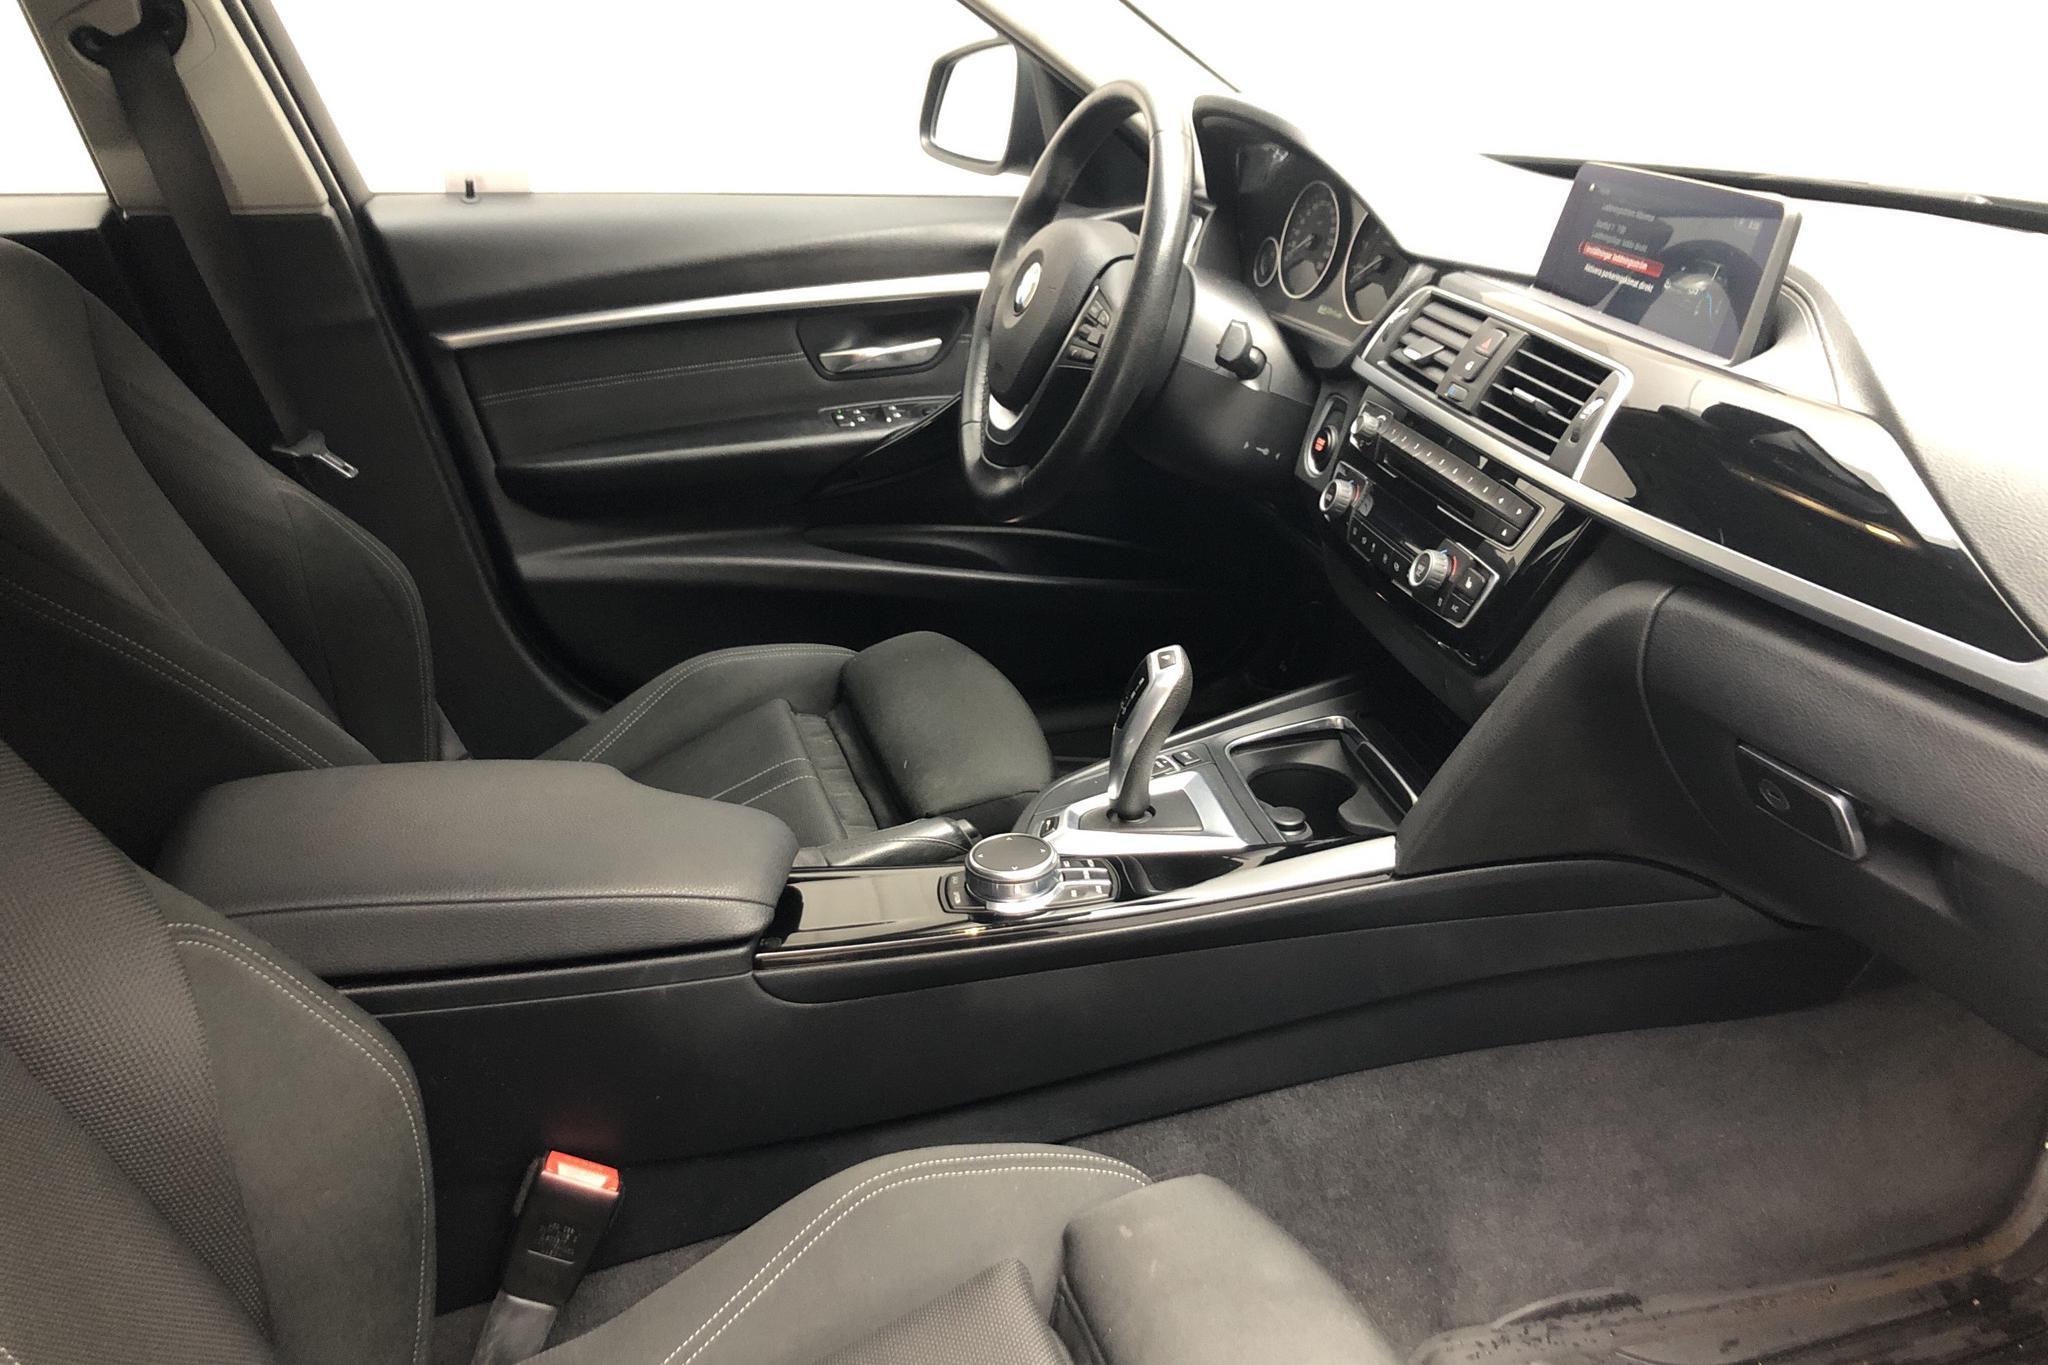 BMW 330e Sedan, F30 (252hk) - 68 680 km - Automatic - black - 2018